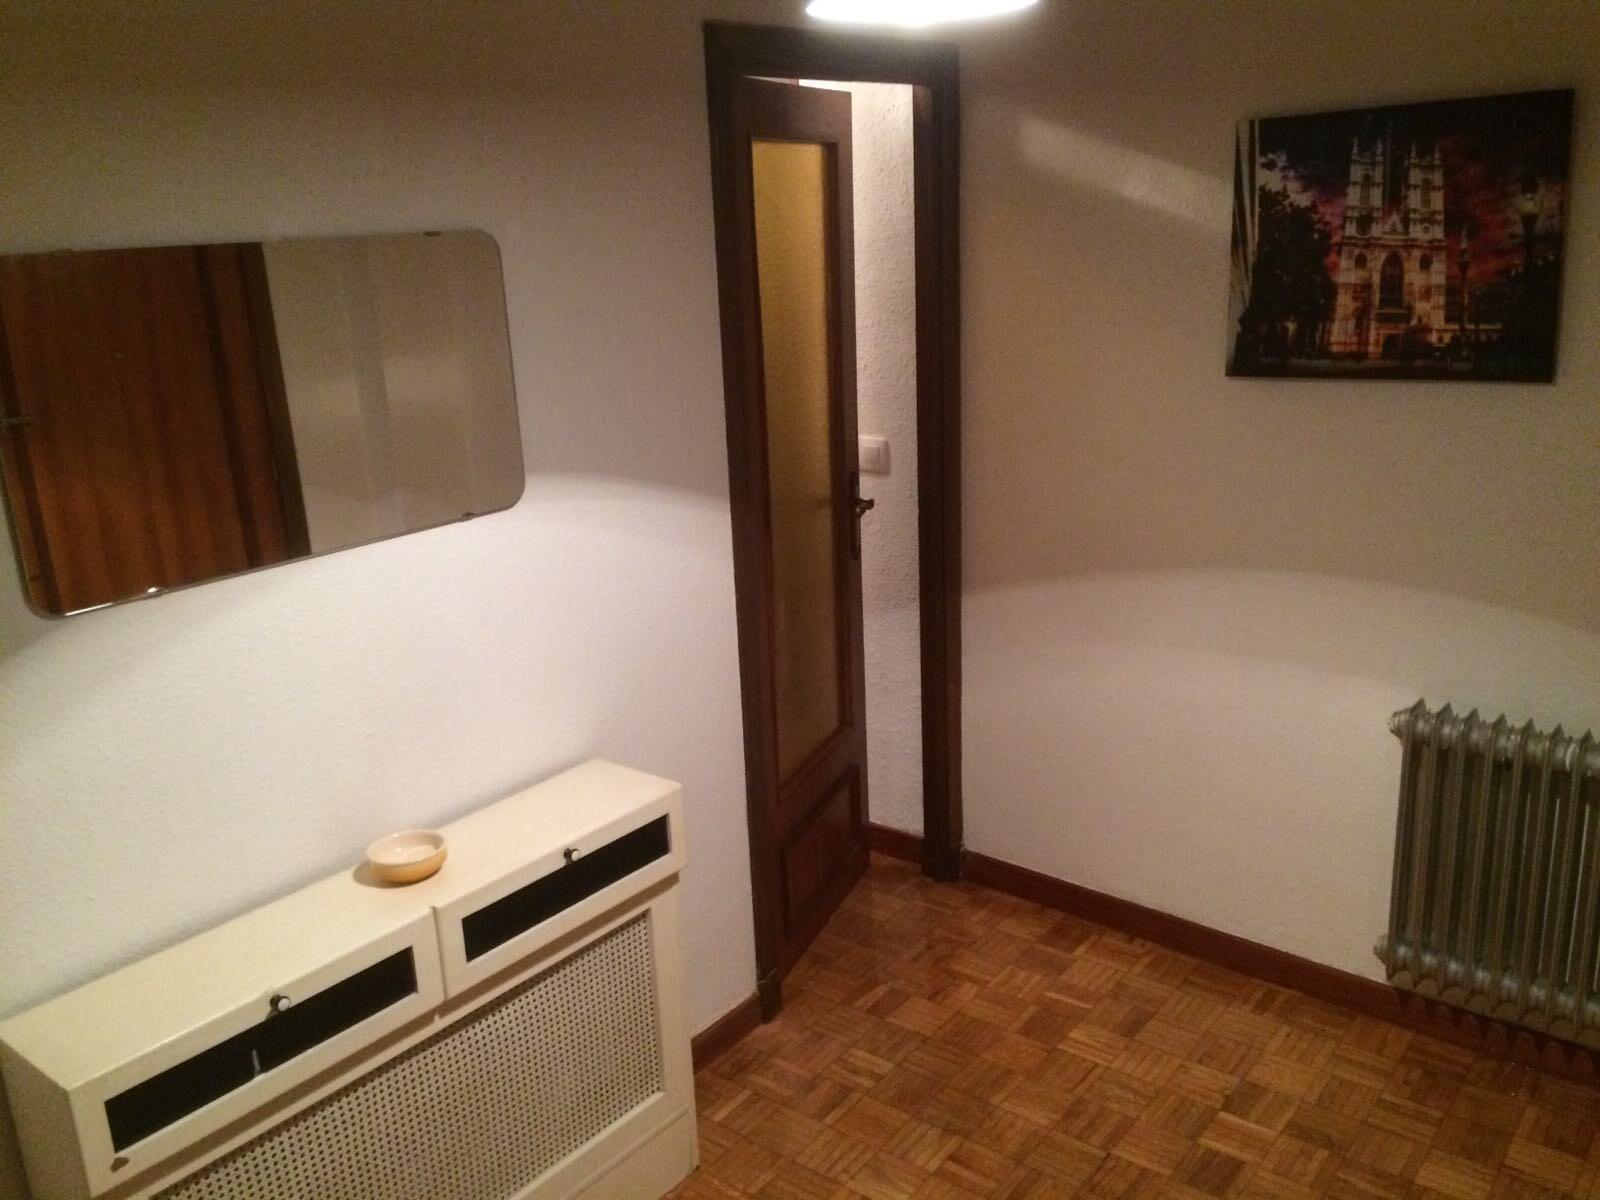 Piso reci n pintado ba os y cocina a estrenar tiene terraza alquiler pisos salamanca - Pintar terraza ...